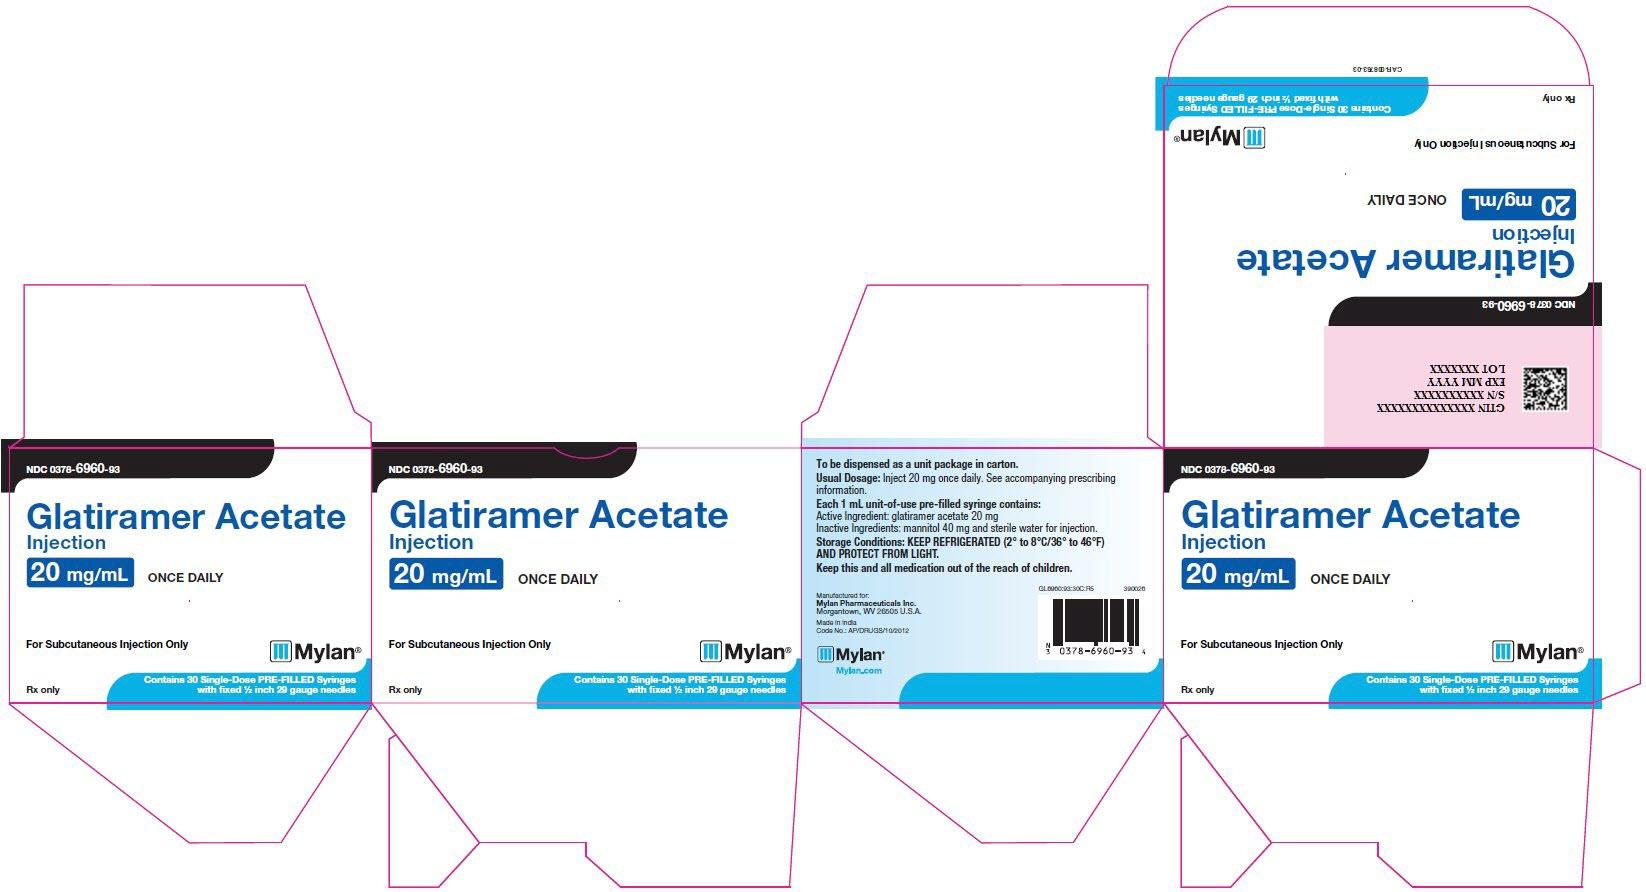 Glatiramer Acetate Injection 20 mg/mL Carton Label